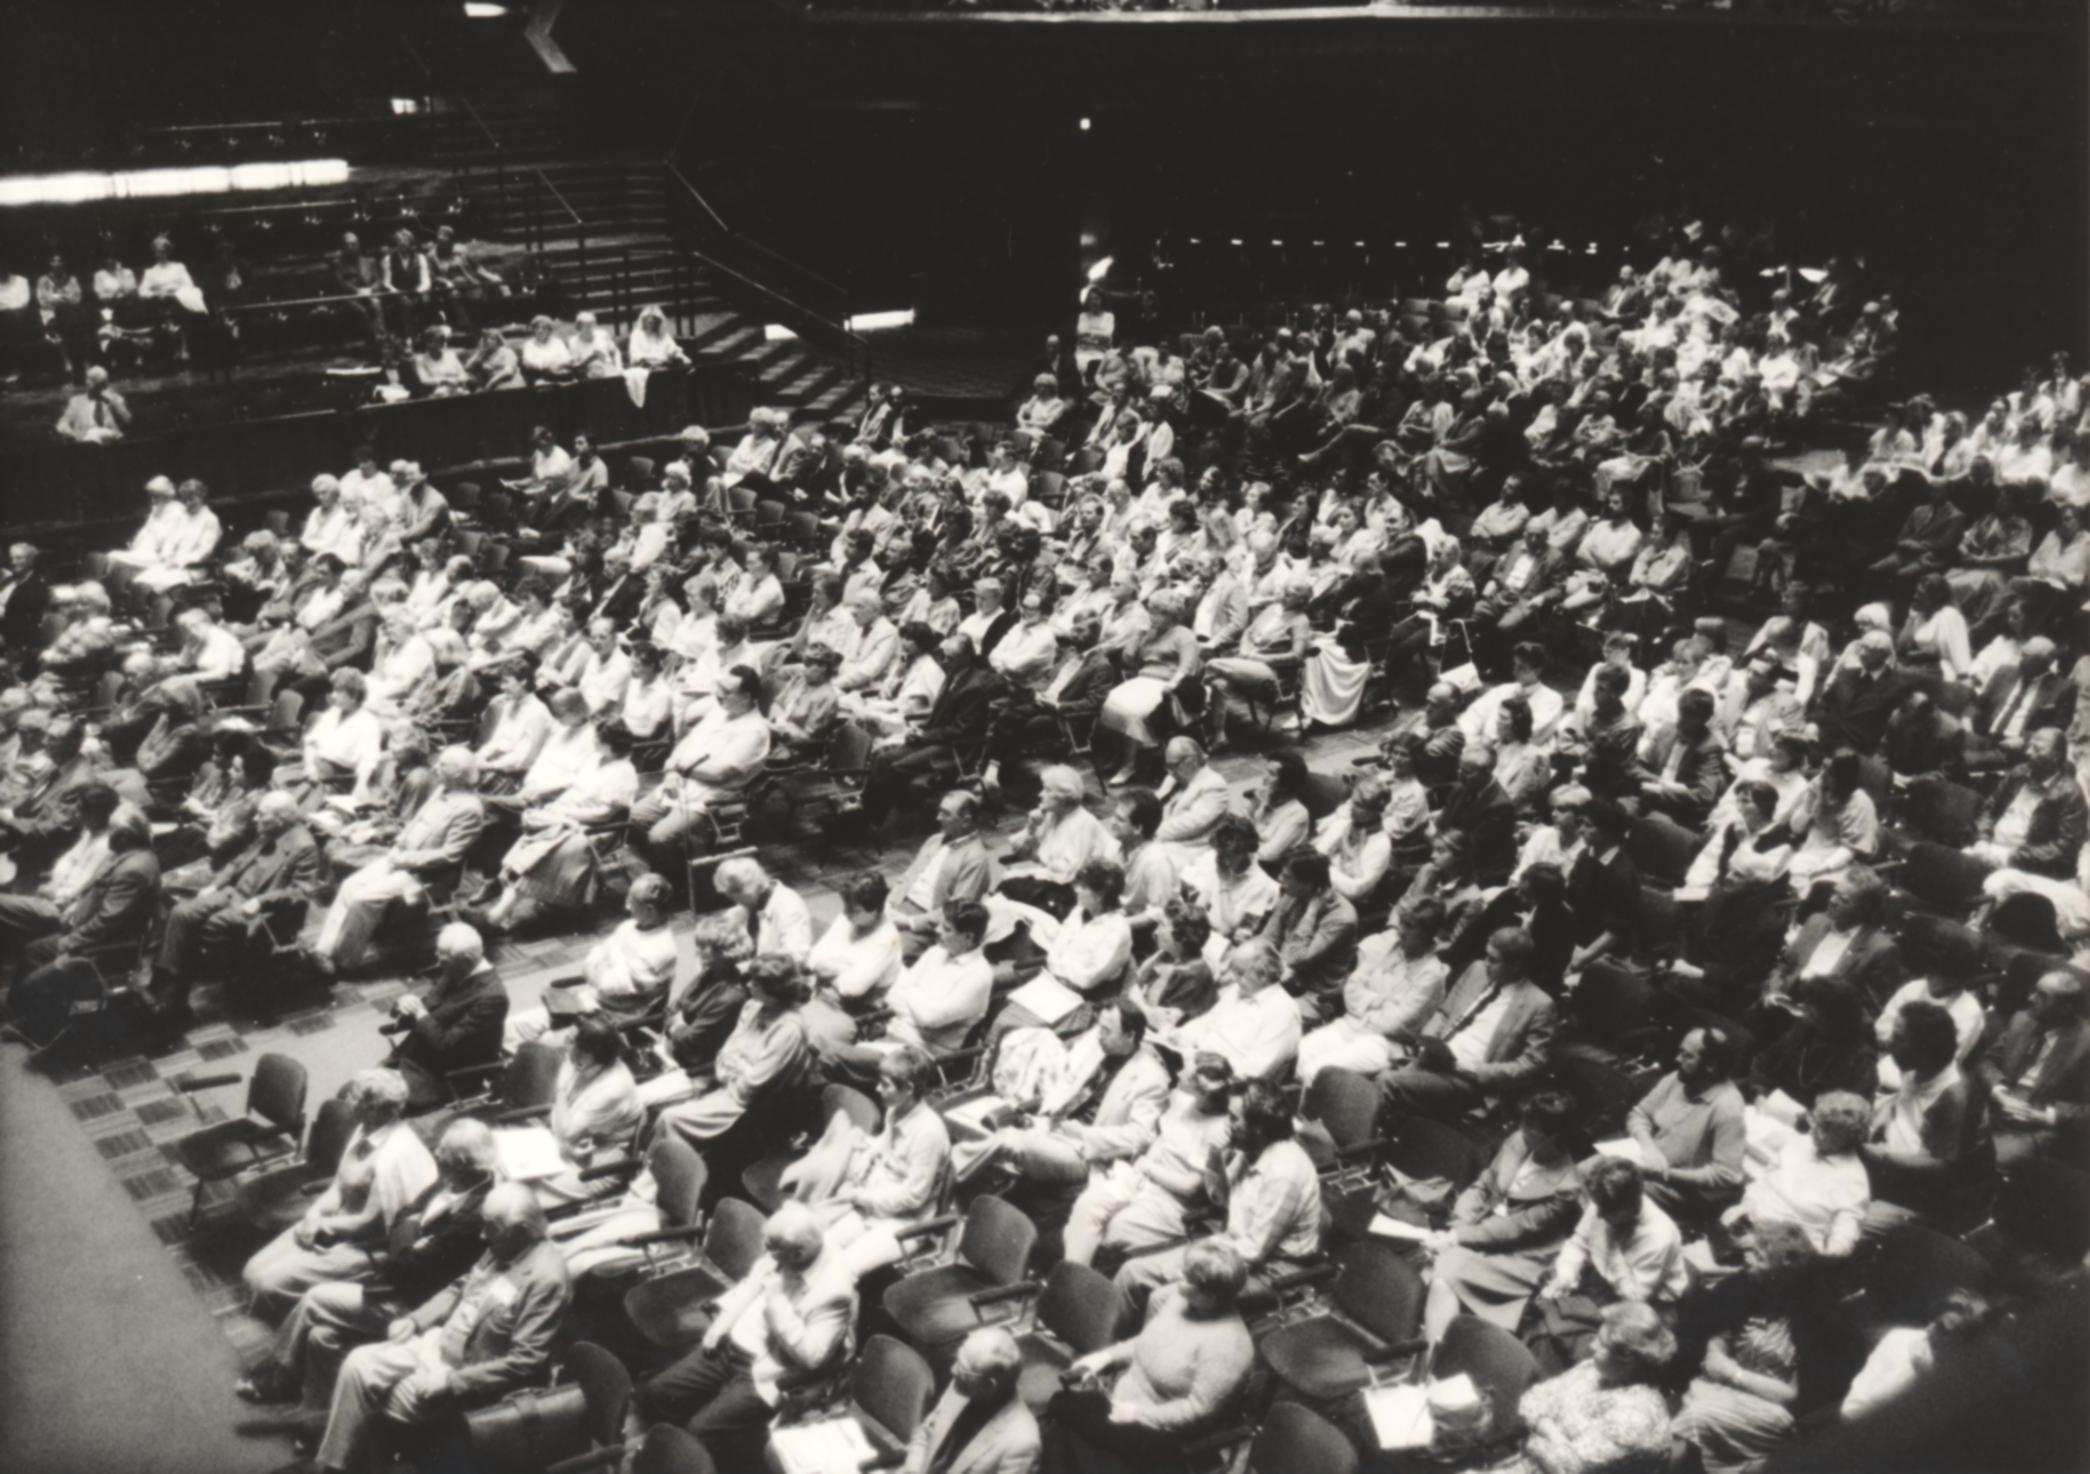 IX. Imago Mundi-Kongress 1982, Innsbruck, Teilnehmerfoto